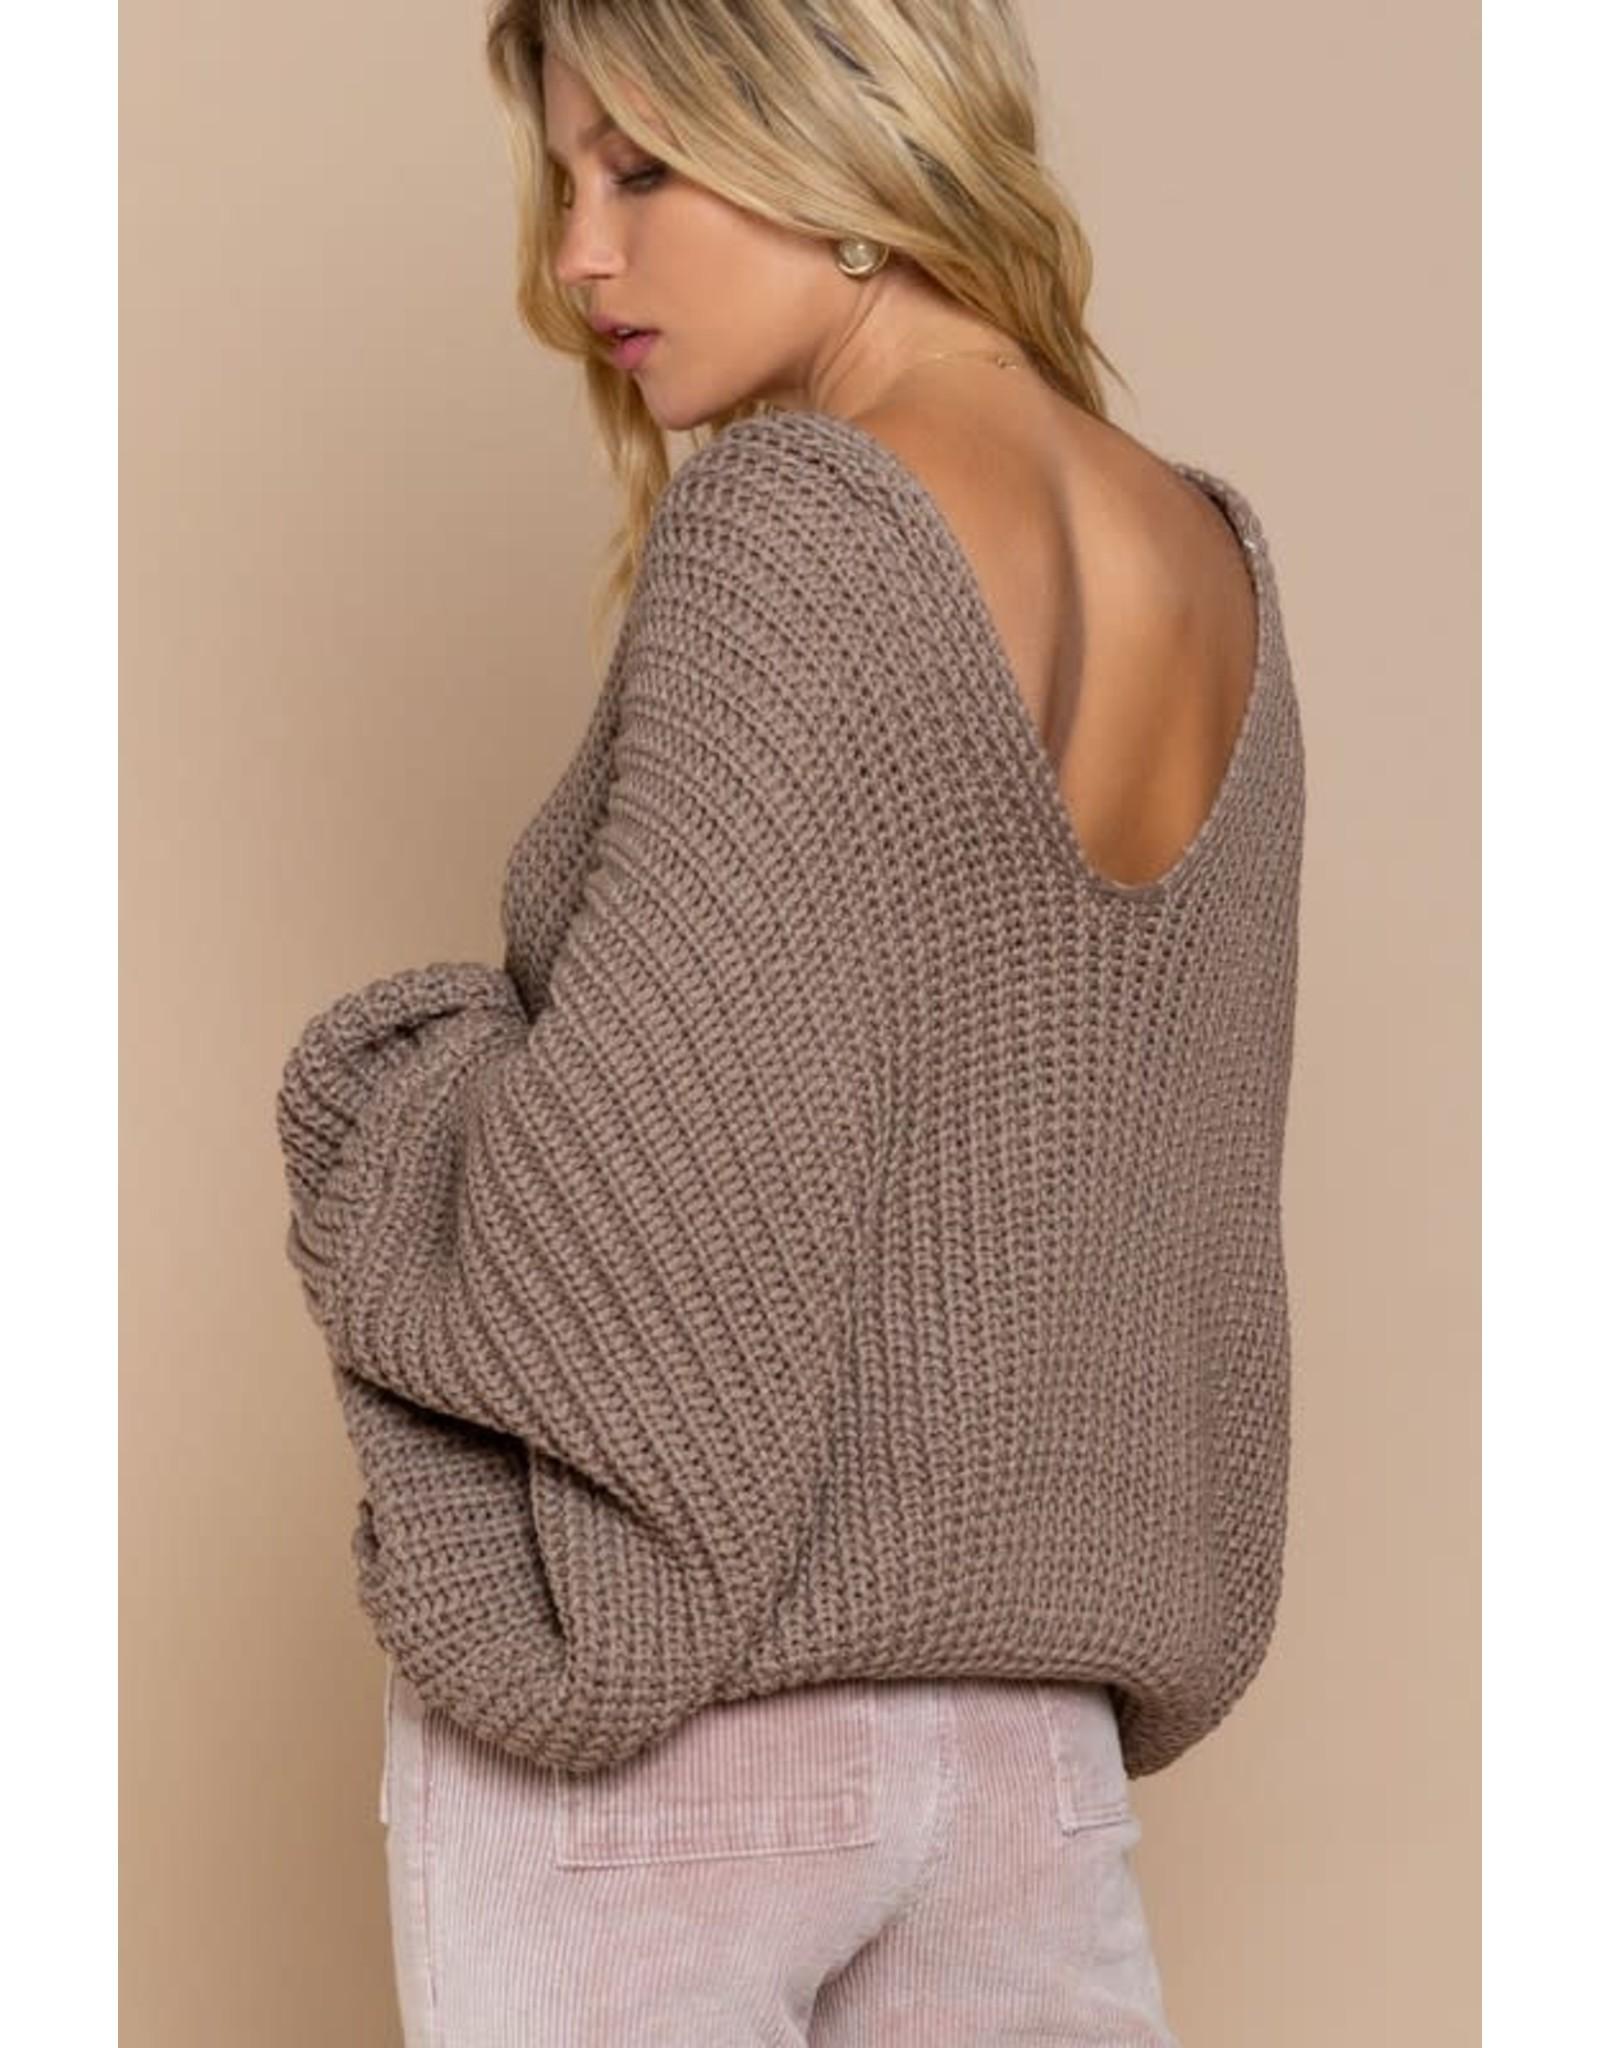 Somethin' Sweet  Sweater